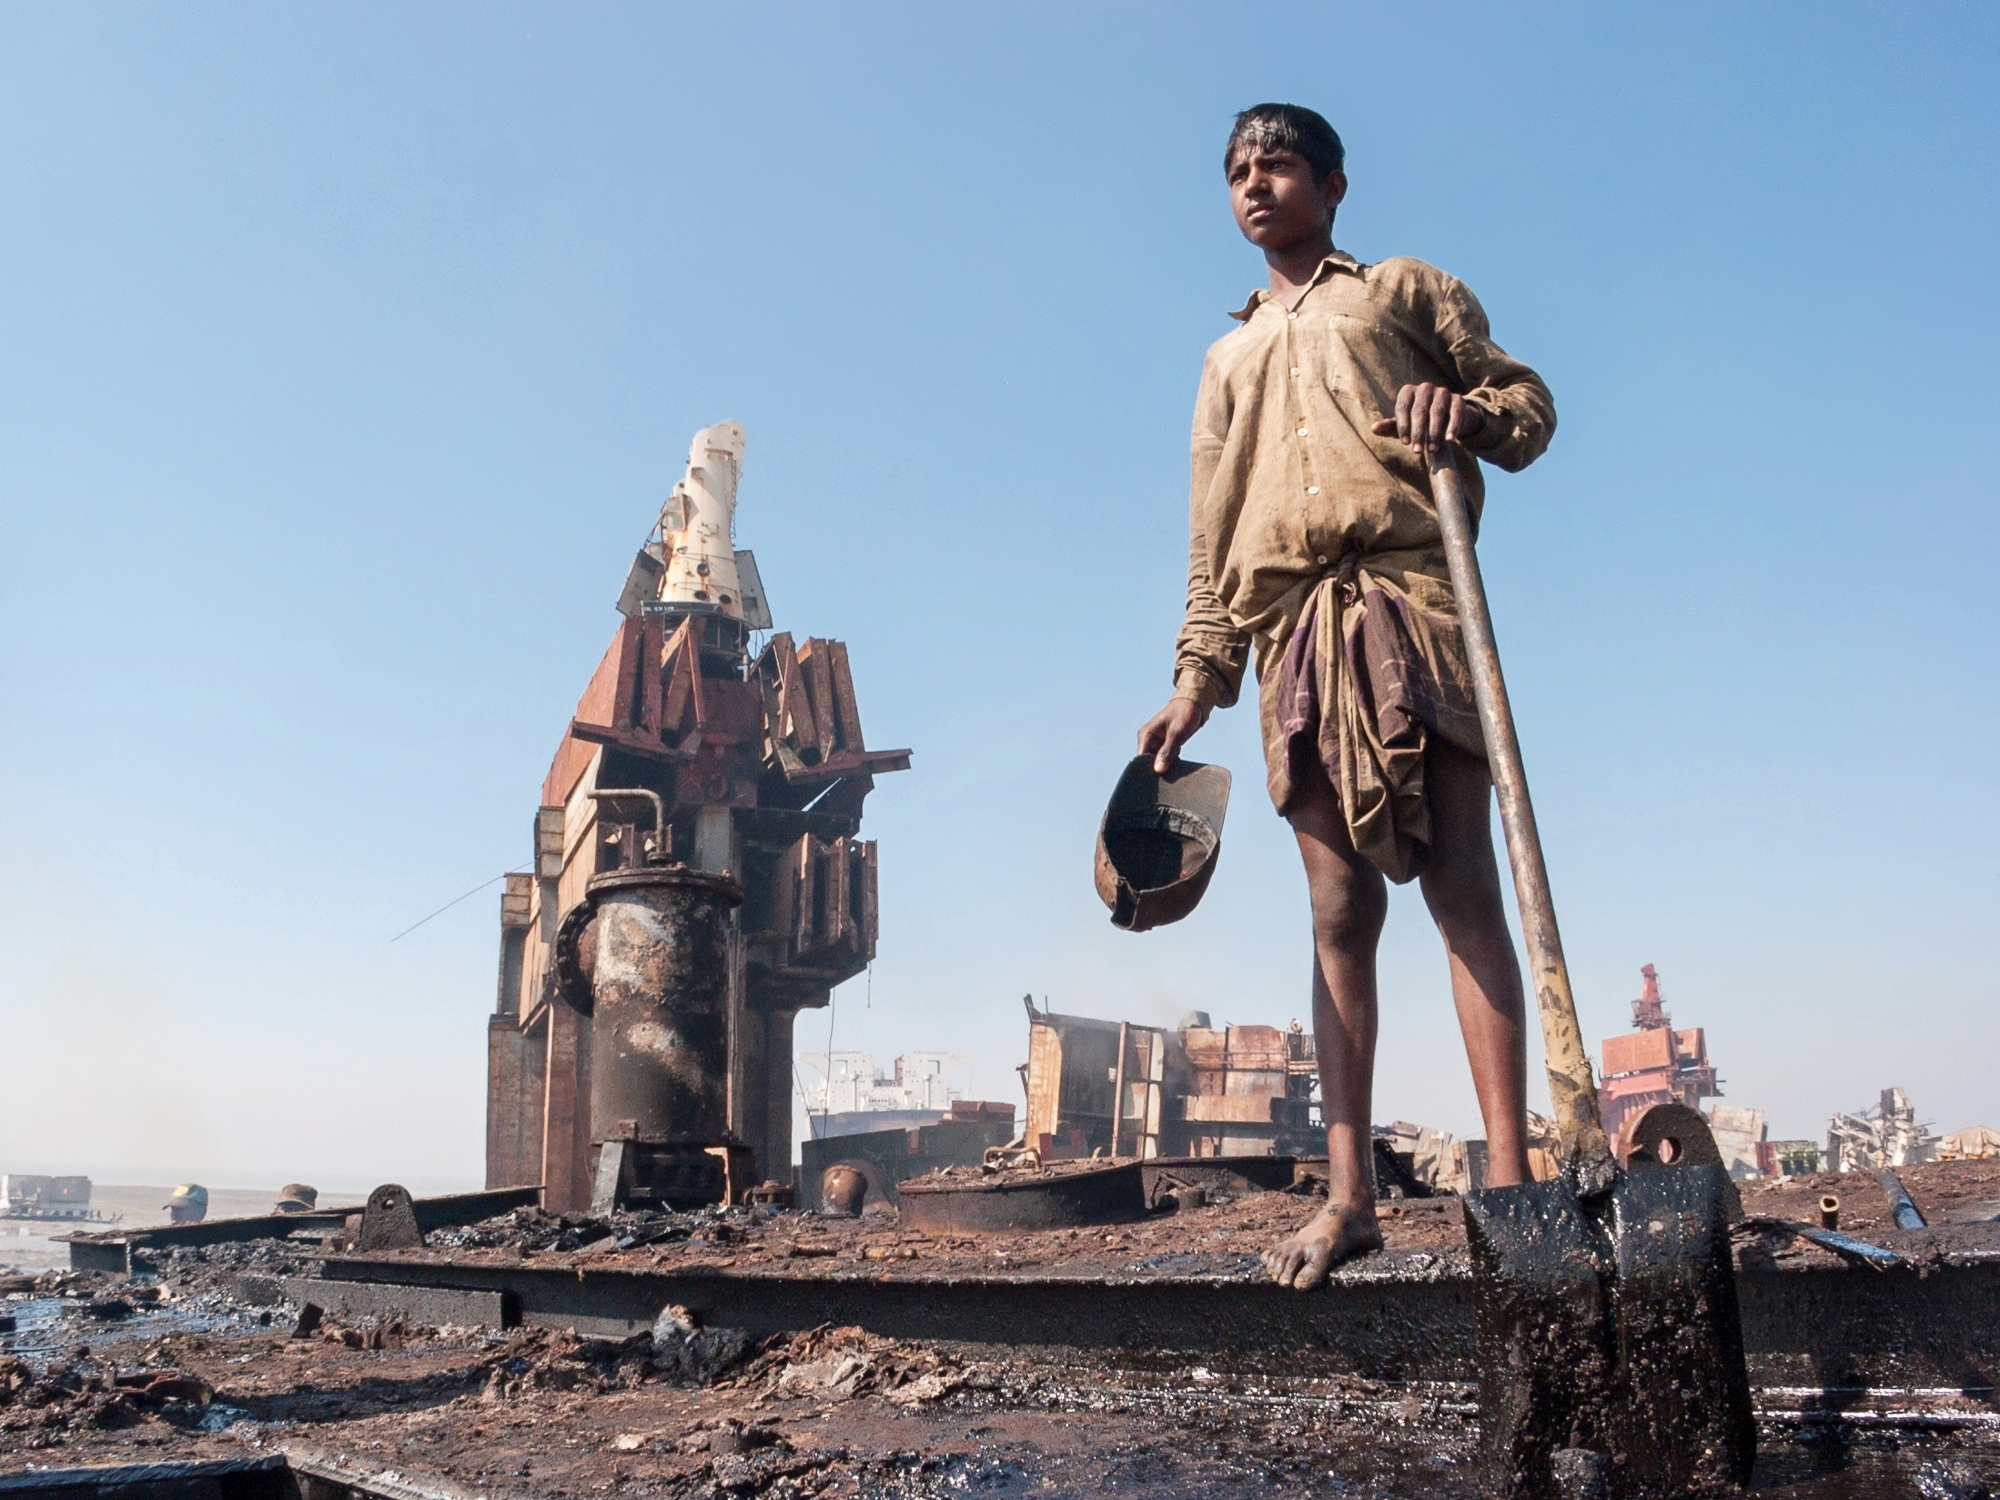 bangladesh-chittagong-shipbreaking-boy.jpg